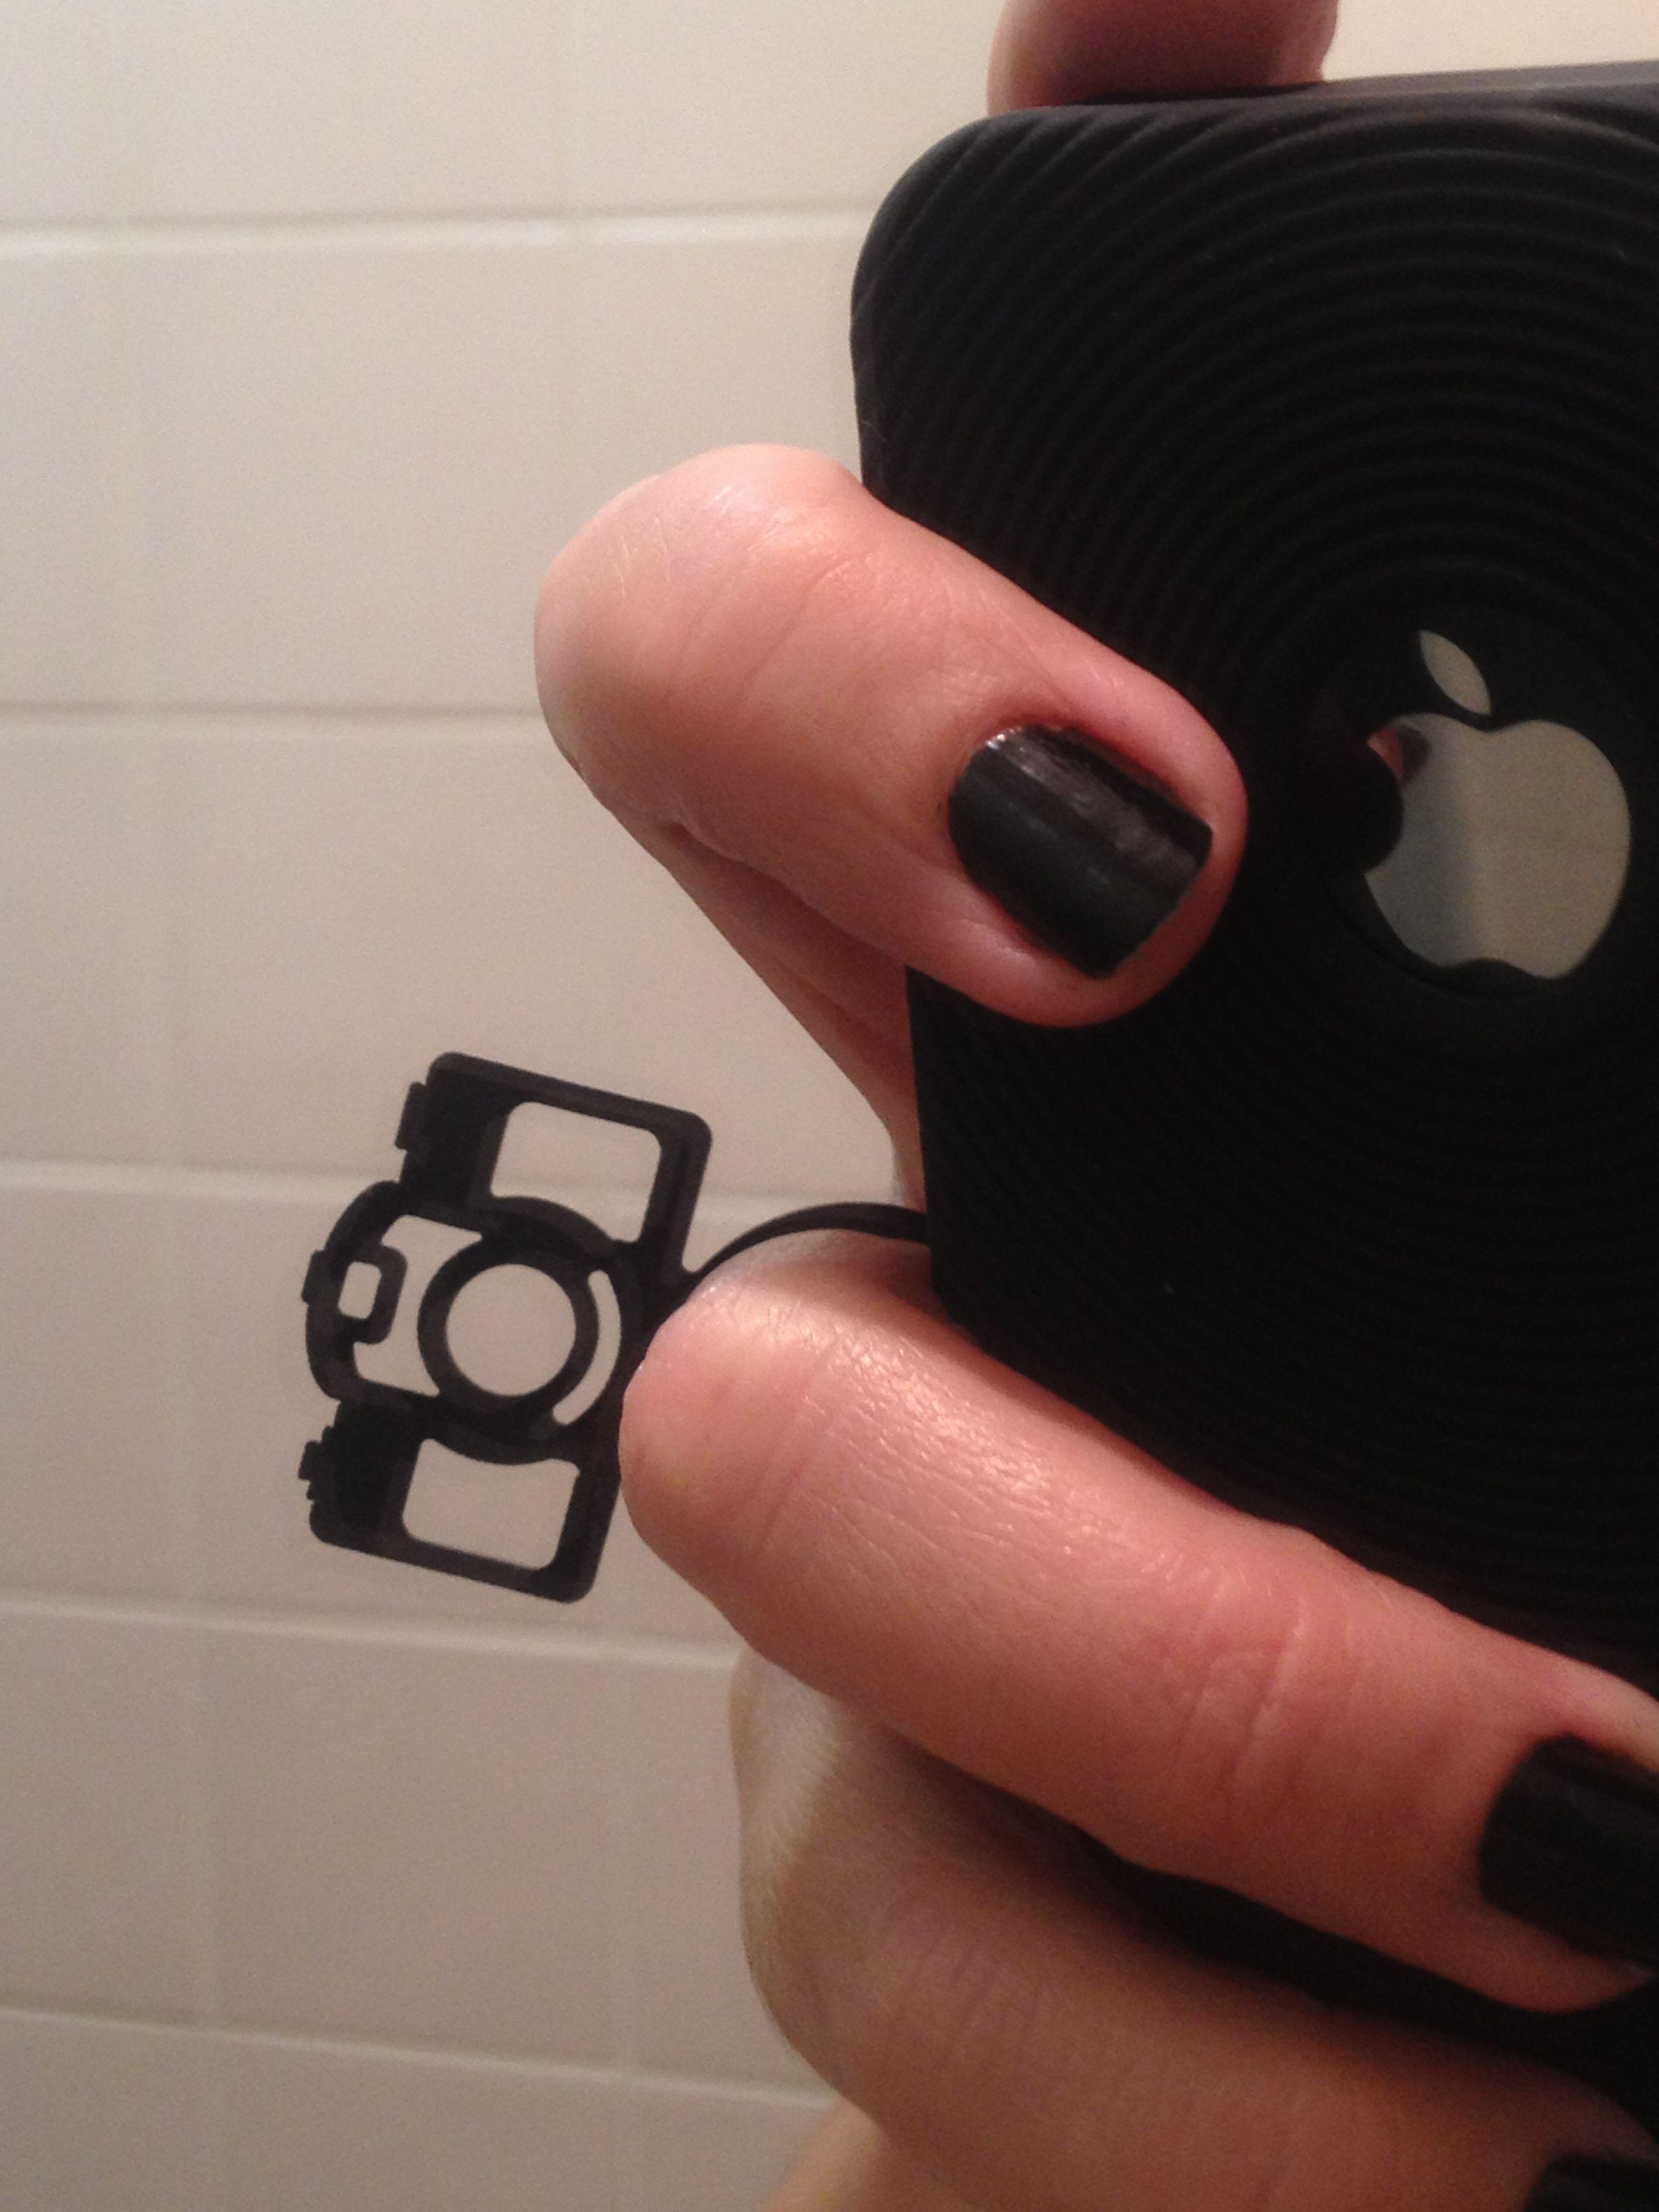 camera ring by Design TUN (Poa/RS/Brasil). Foto: Flavya Mutran